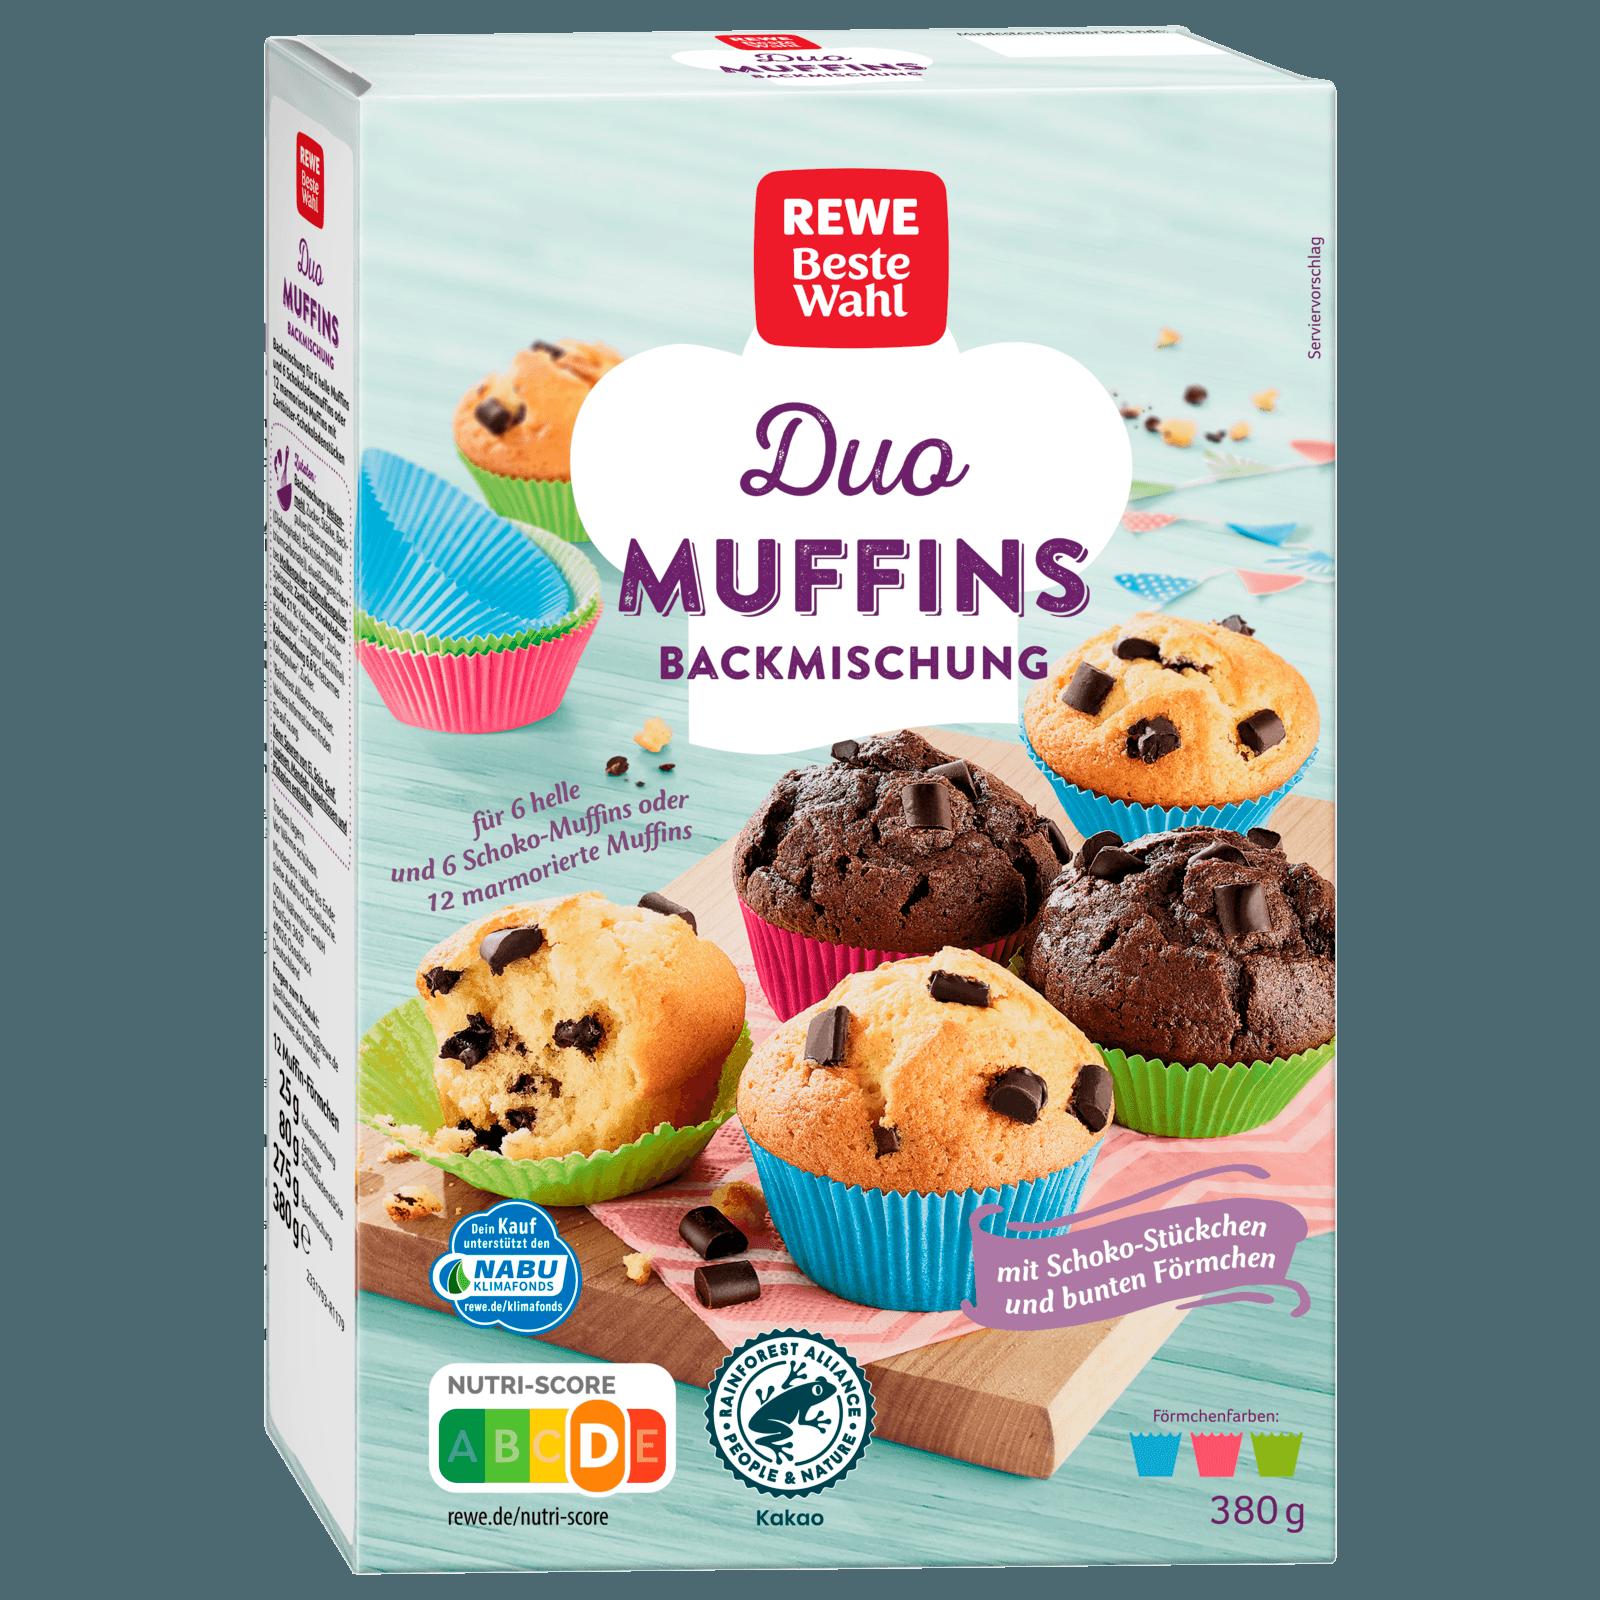 Rewe Beste Wahl Duo Muffins Backmischung 335g Bei Rewe Online Bestellen